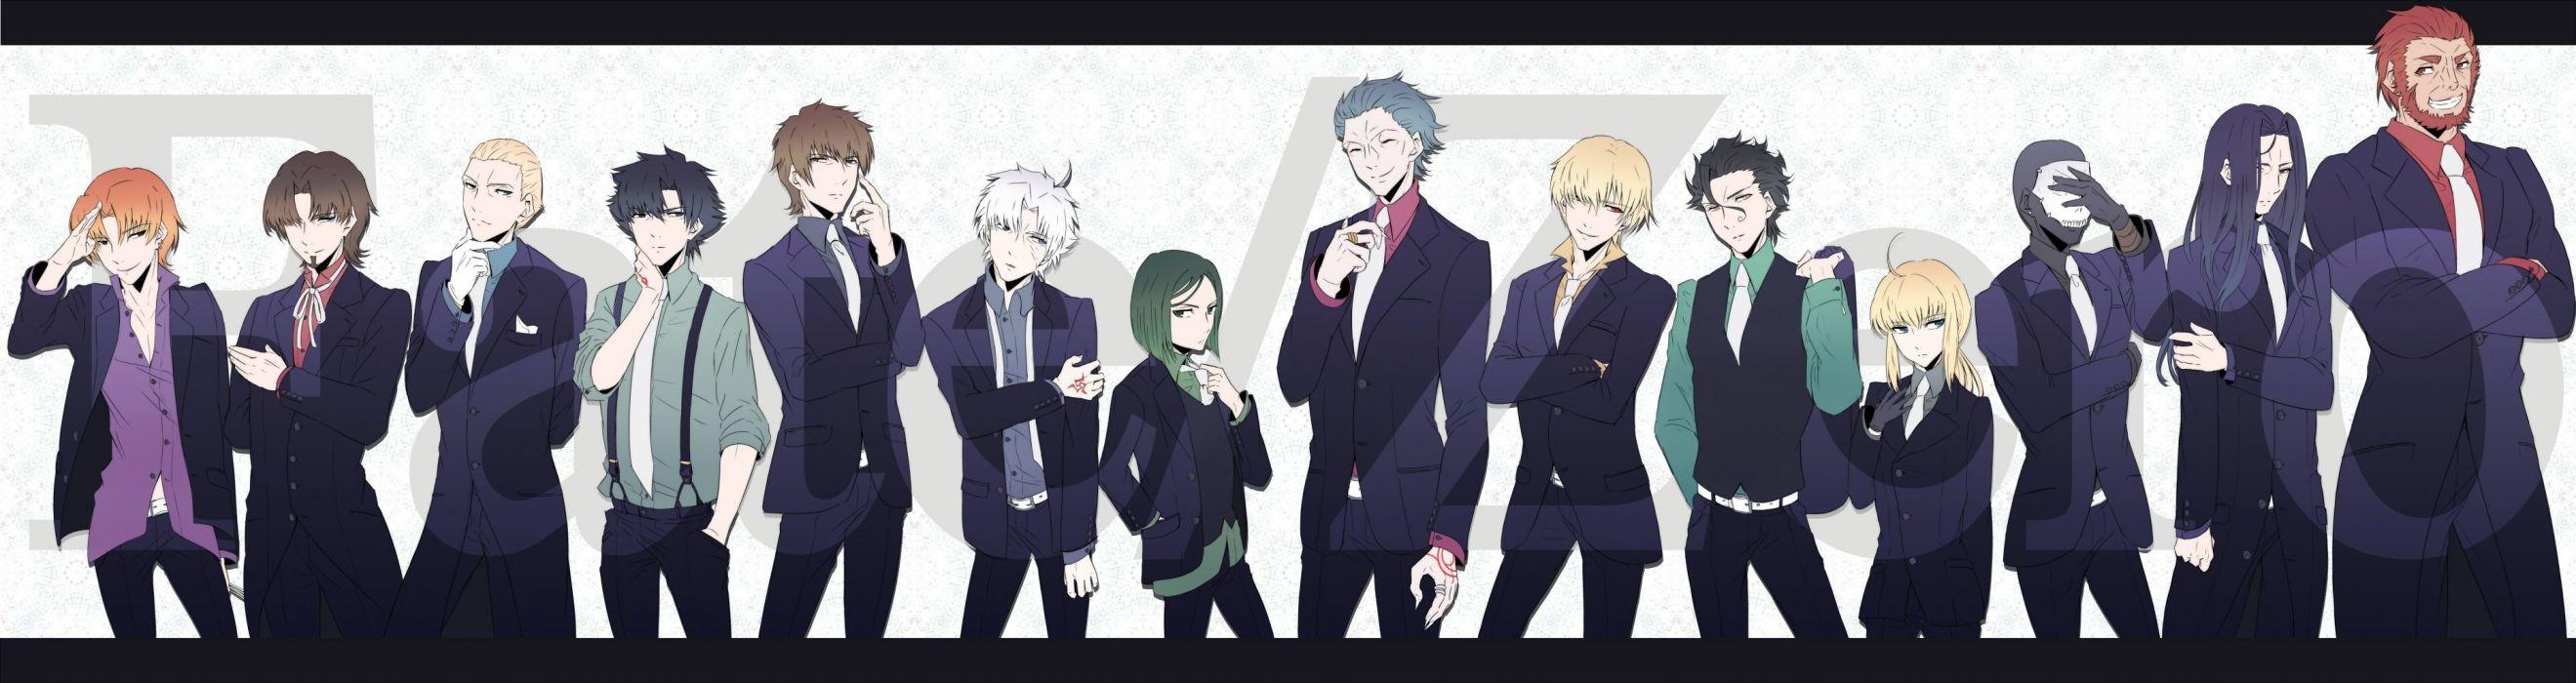 Fate Series (64) wallpaper